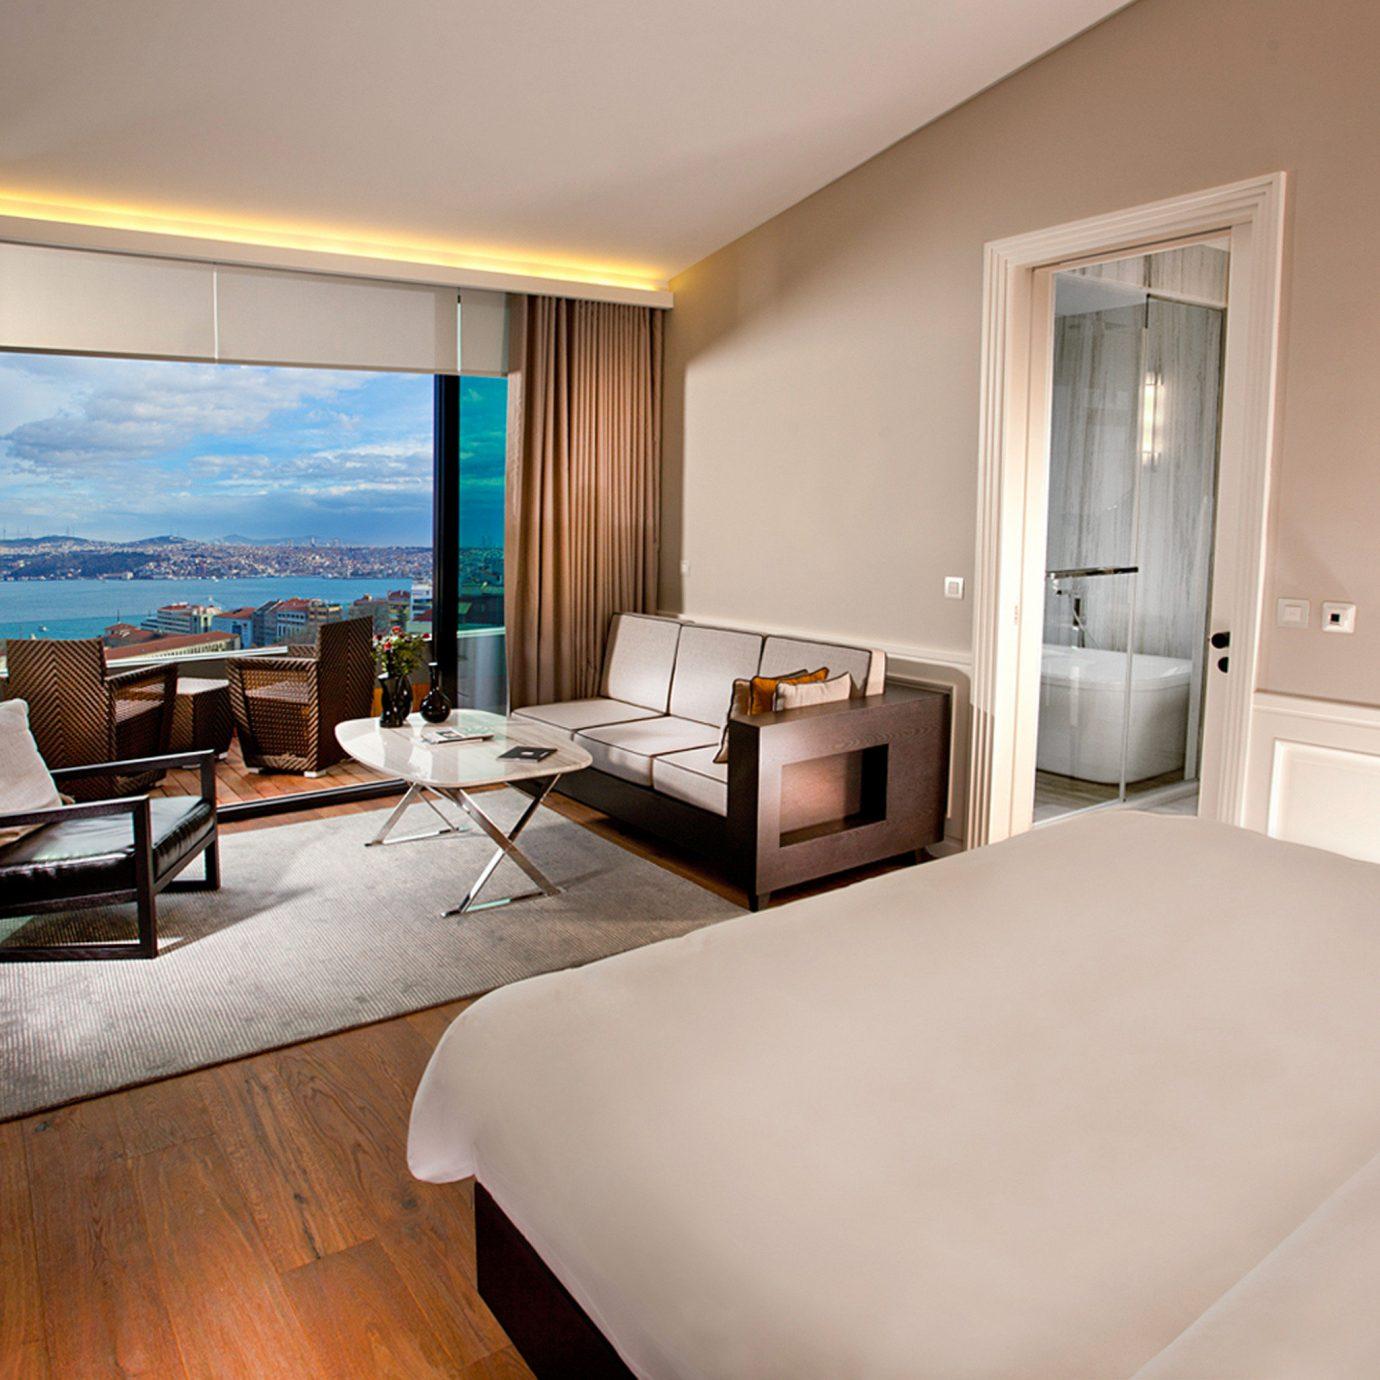 Balcony Bath Bedroom Modern Patio Resort Scenic views property Suite condominium home living room cottage Villa